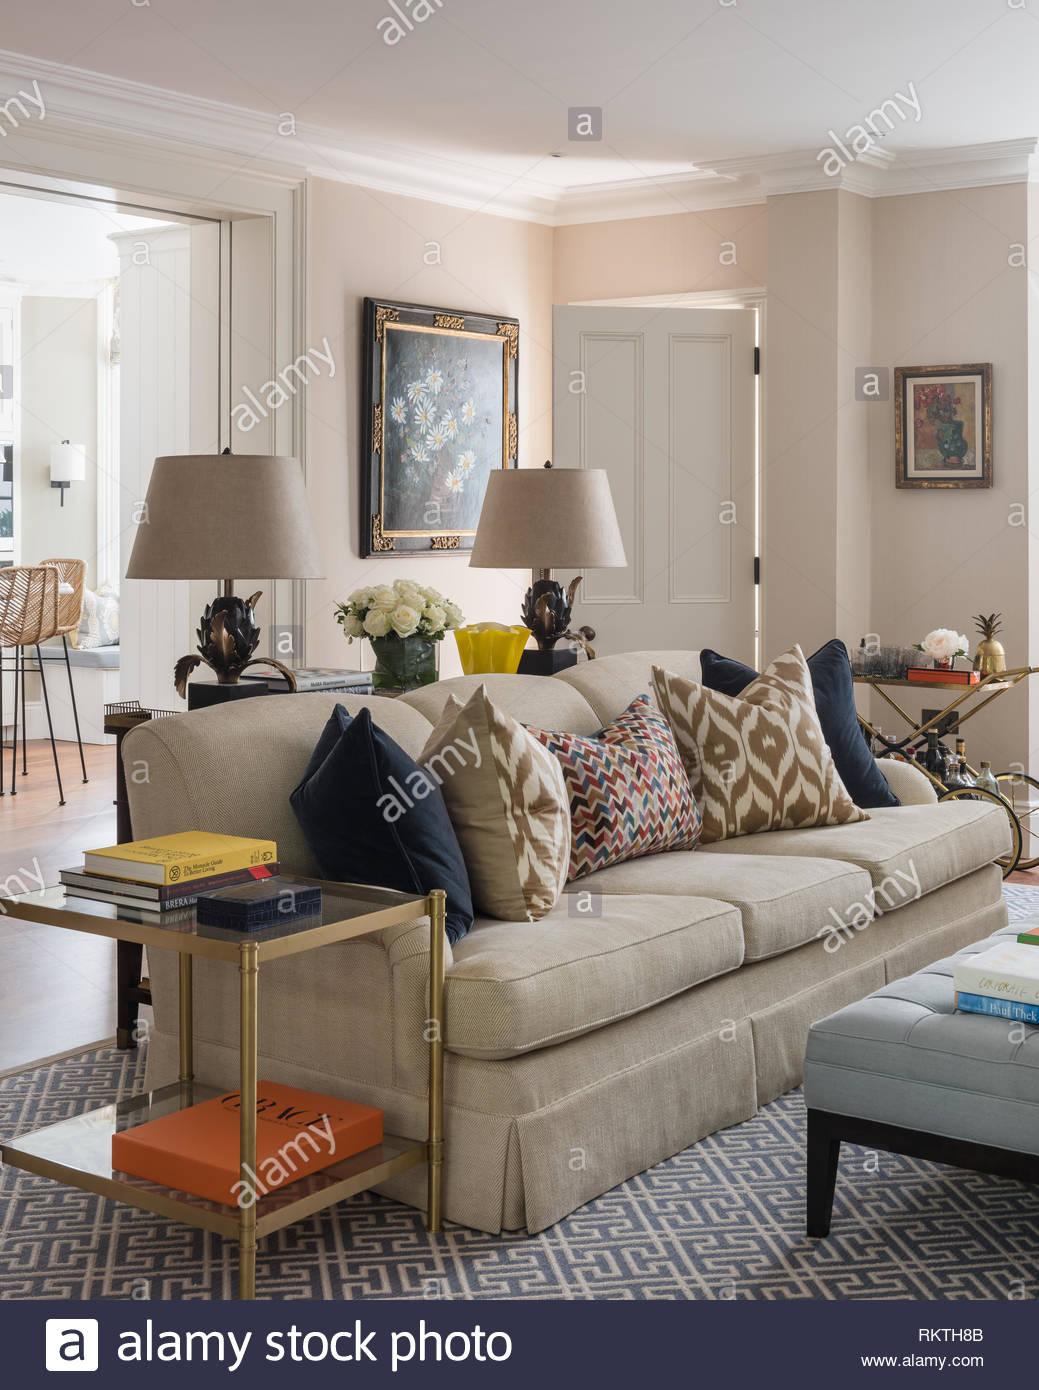 Ikat cushions on cream sofa in Kensington home - Stock Image